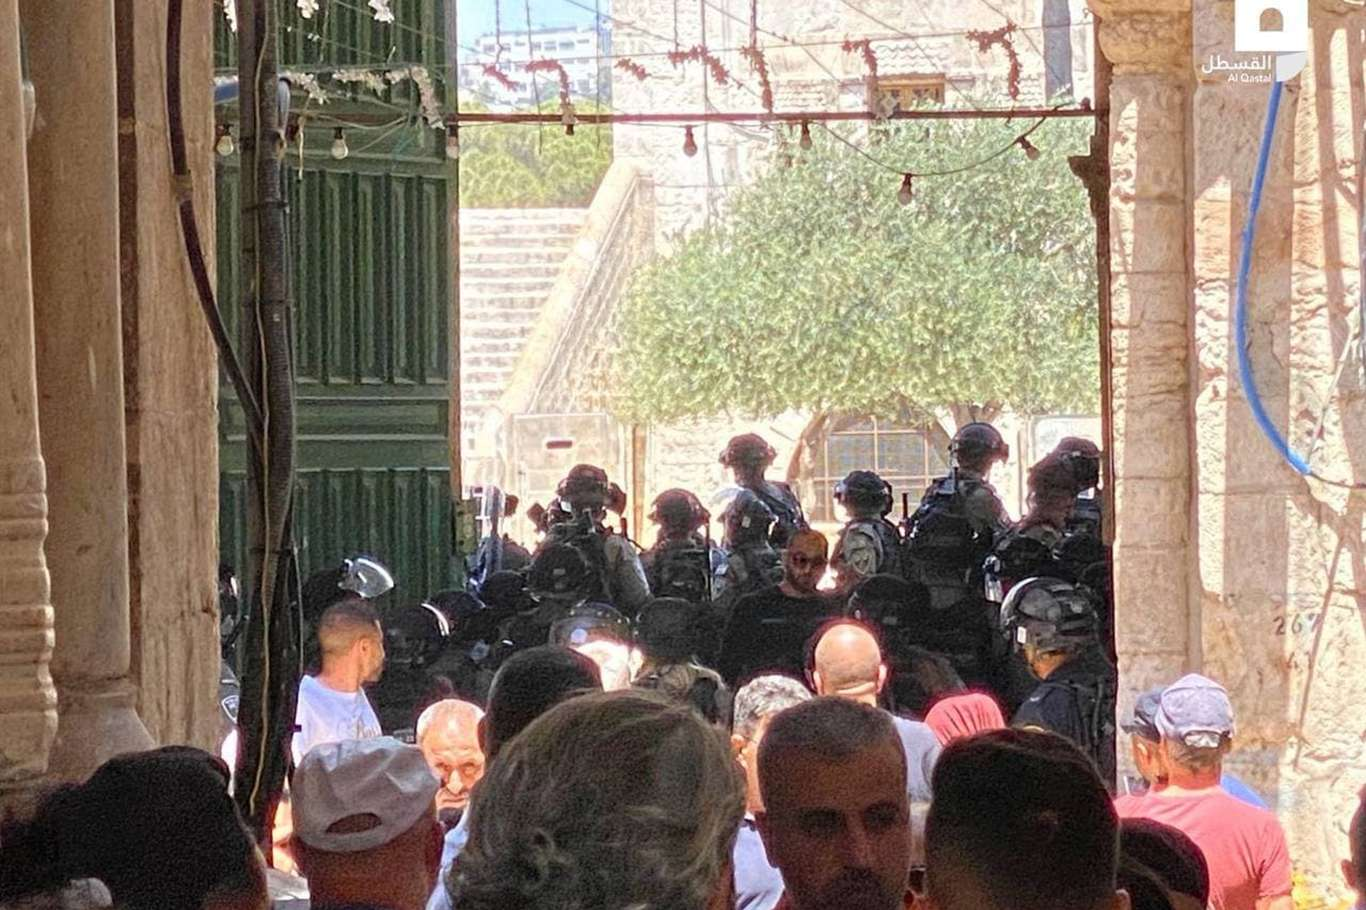 Siyonist işgal rejimi Mescid-i Aksa'da Filistinlilere saldırdı